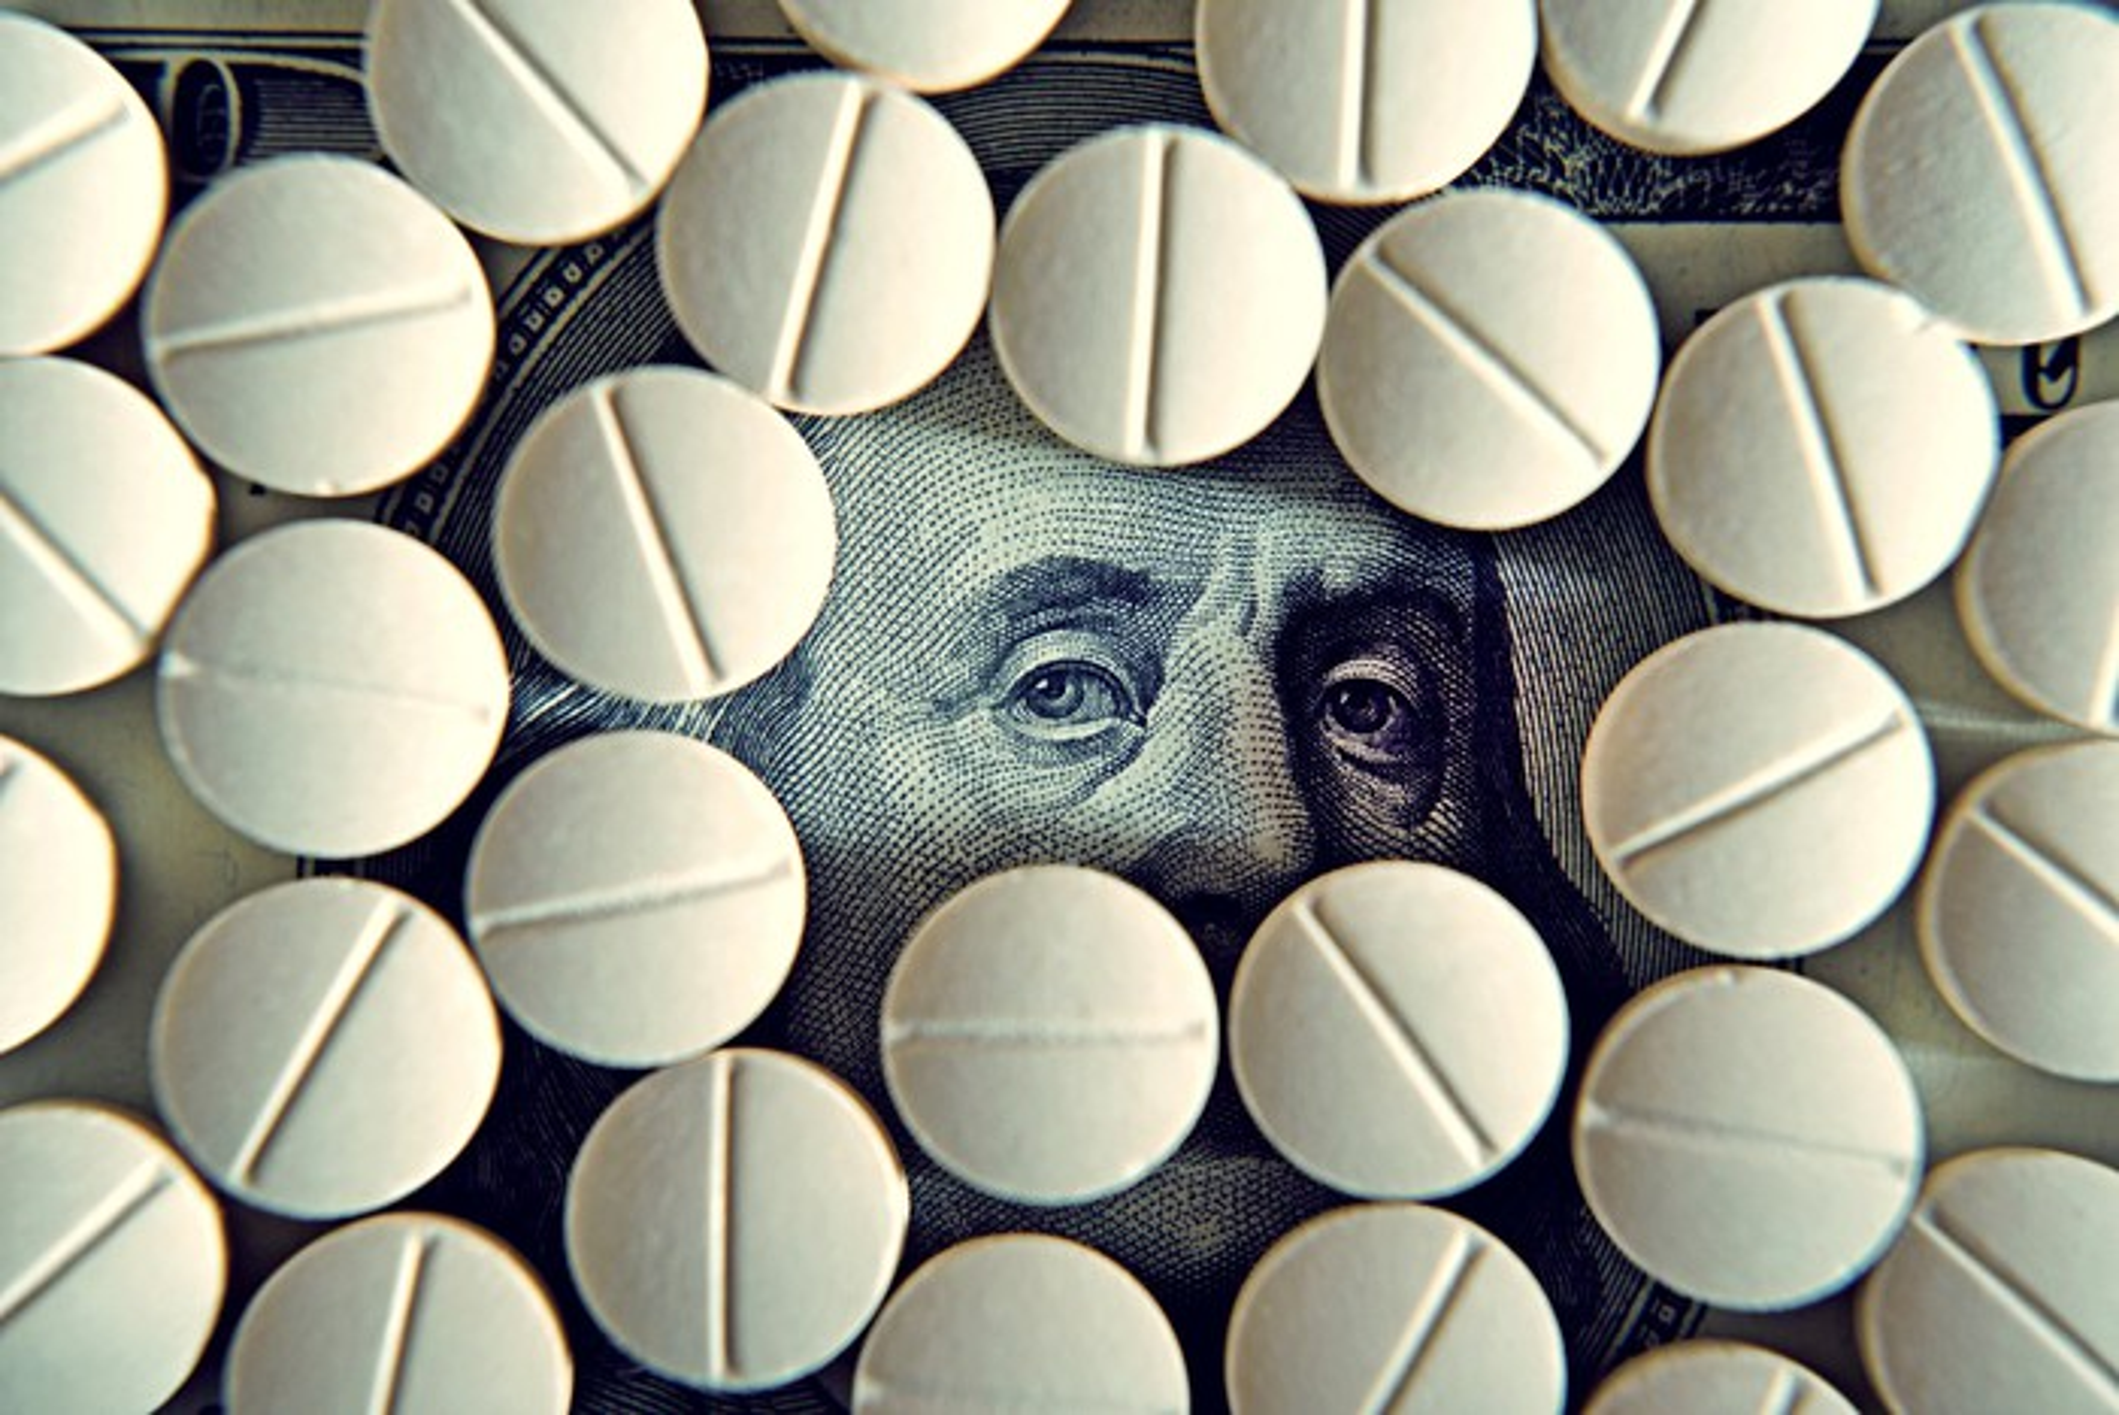 Pills sitting atop a hundred dollar bill.